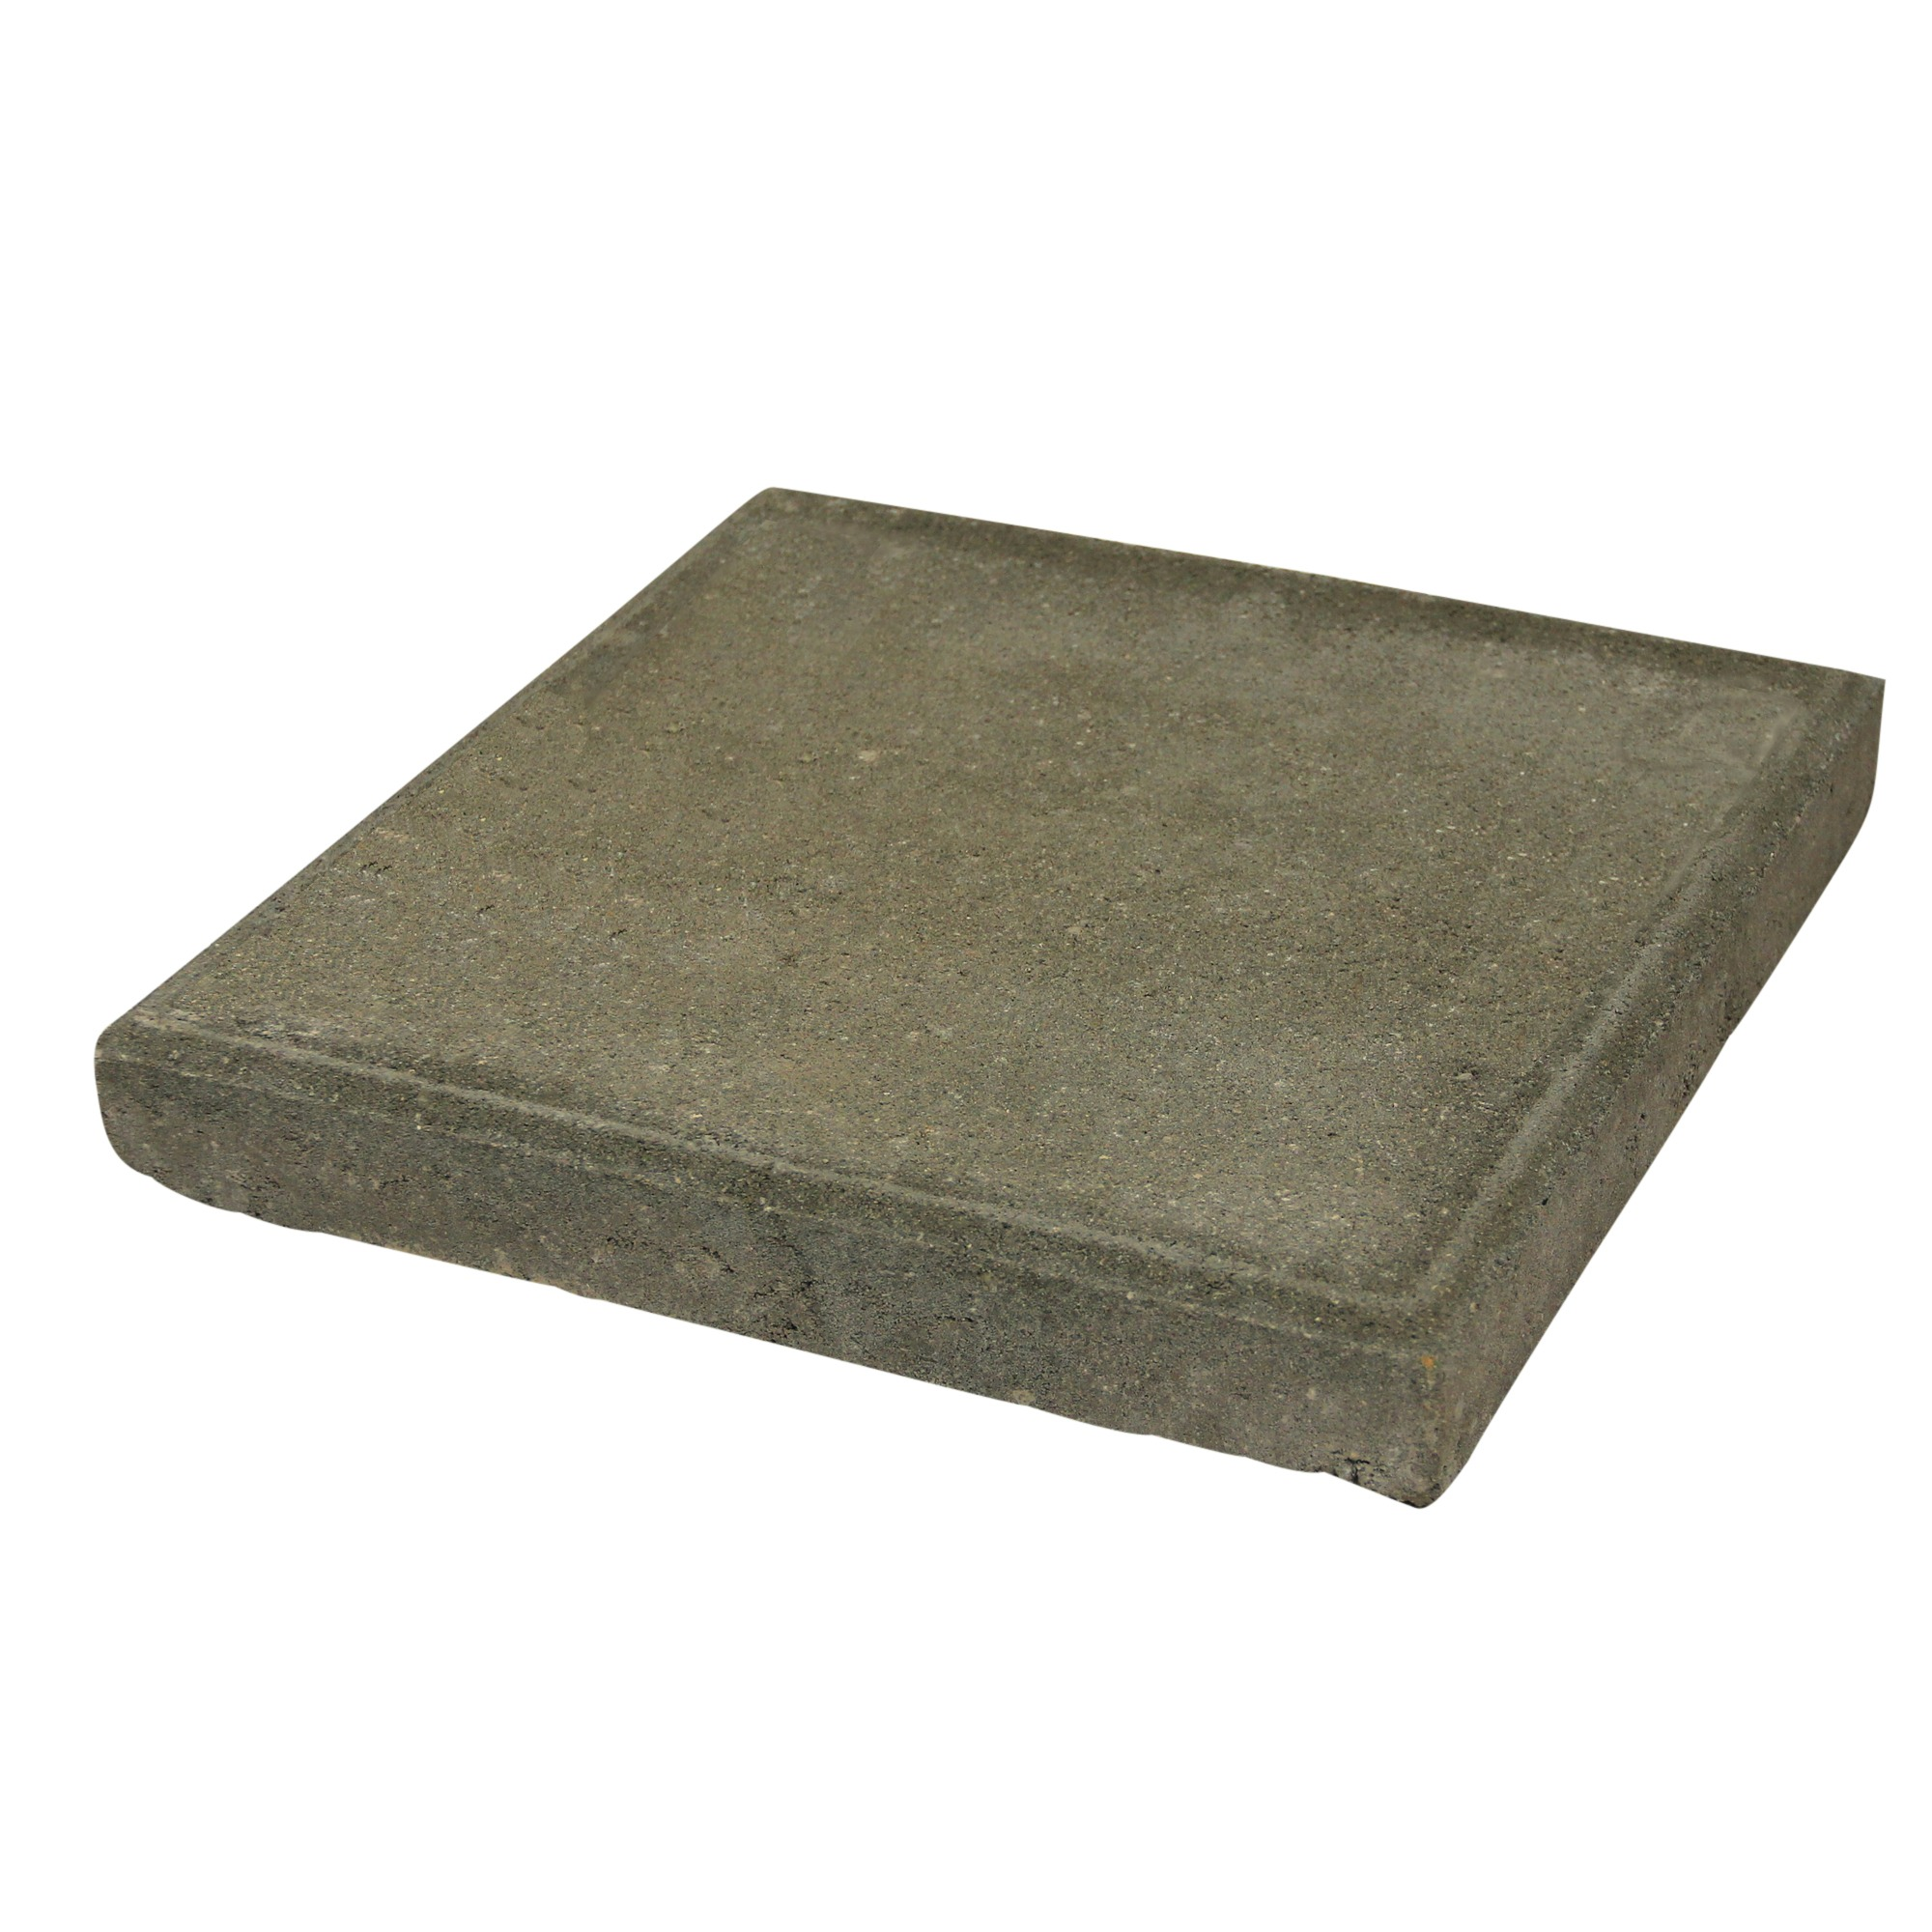 Betontegel Grijs 30x30 cm - 120 Tegels - 10,80 m2